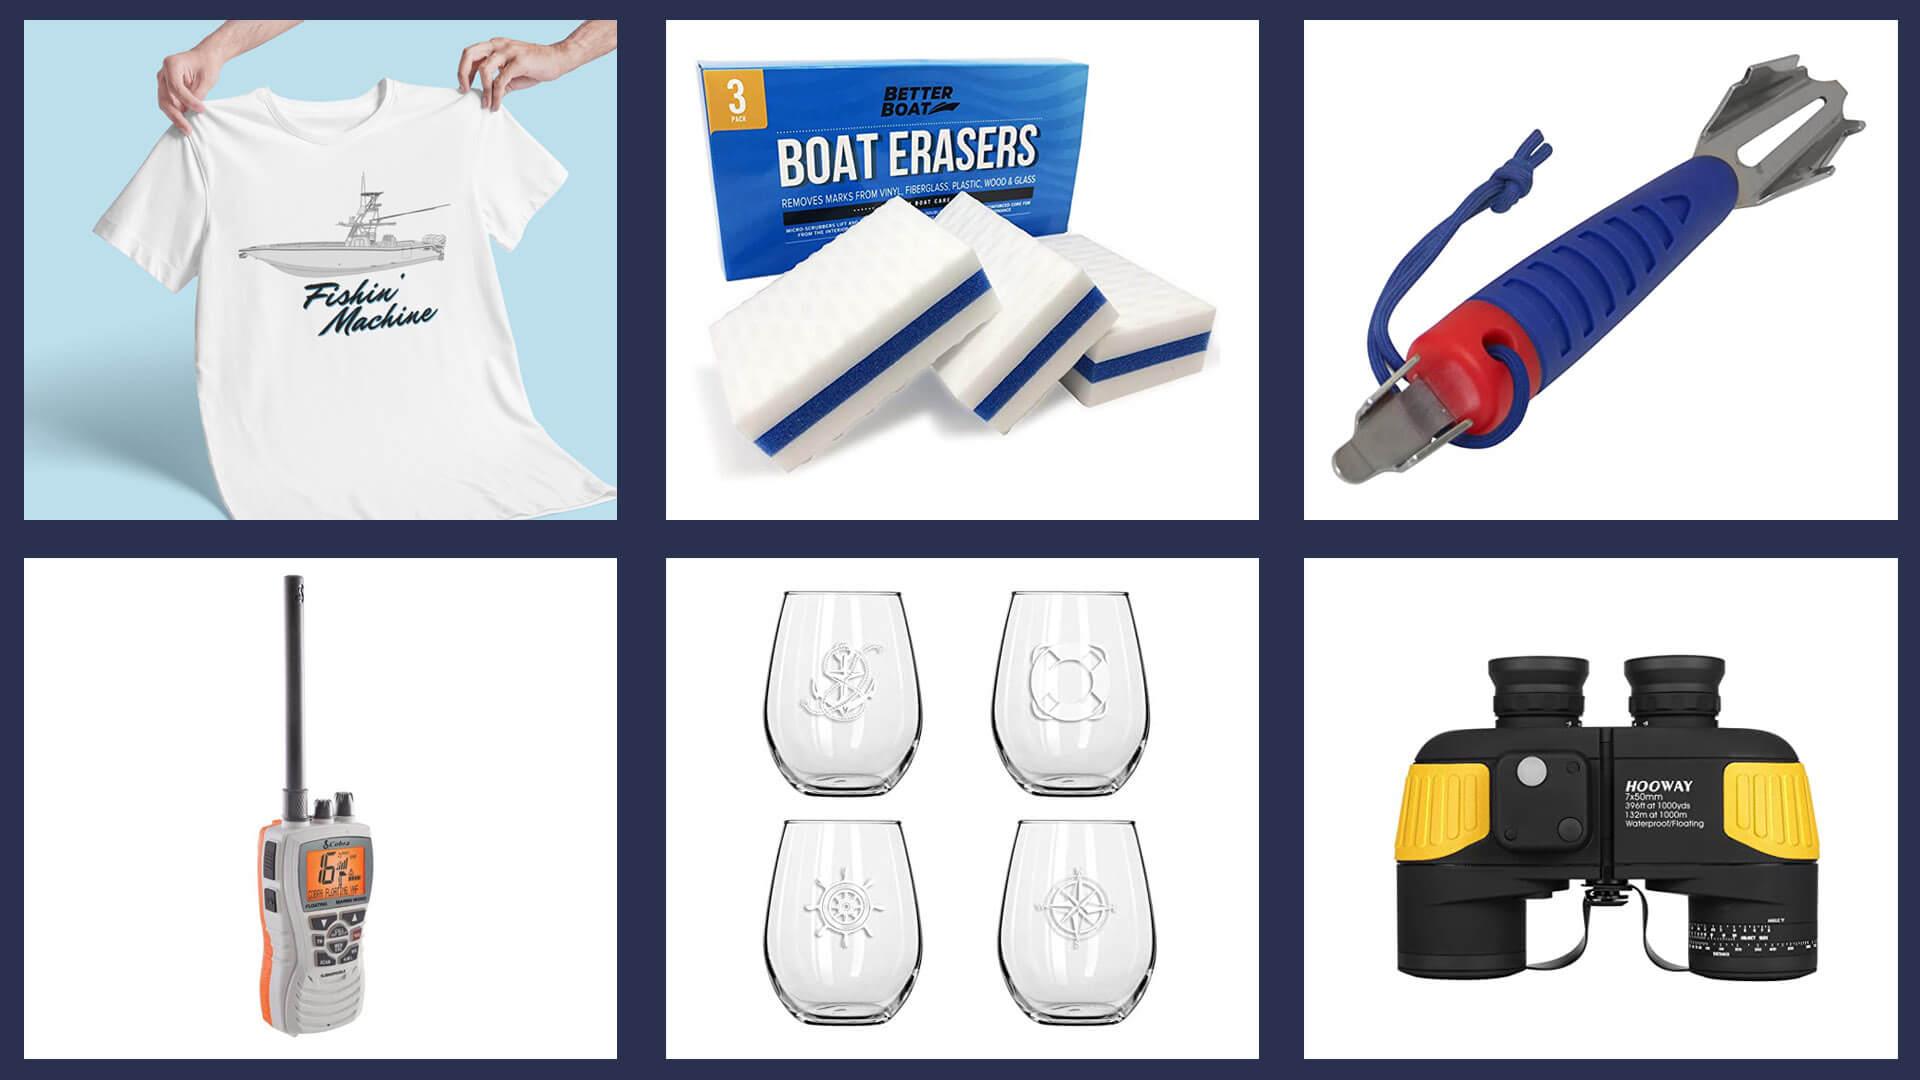 An image of the custom boat gear created by Custom Yacht Shirts